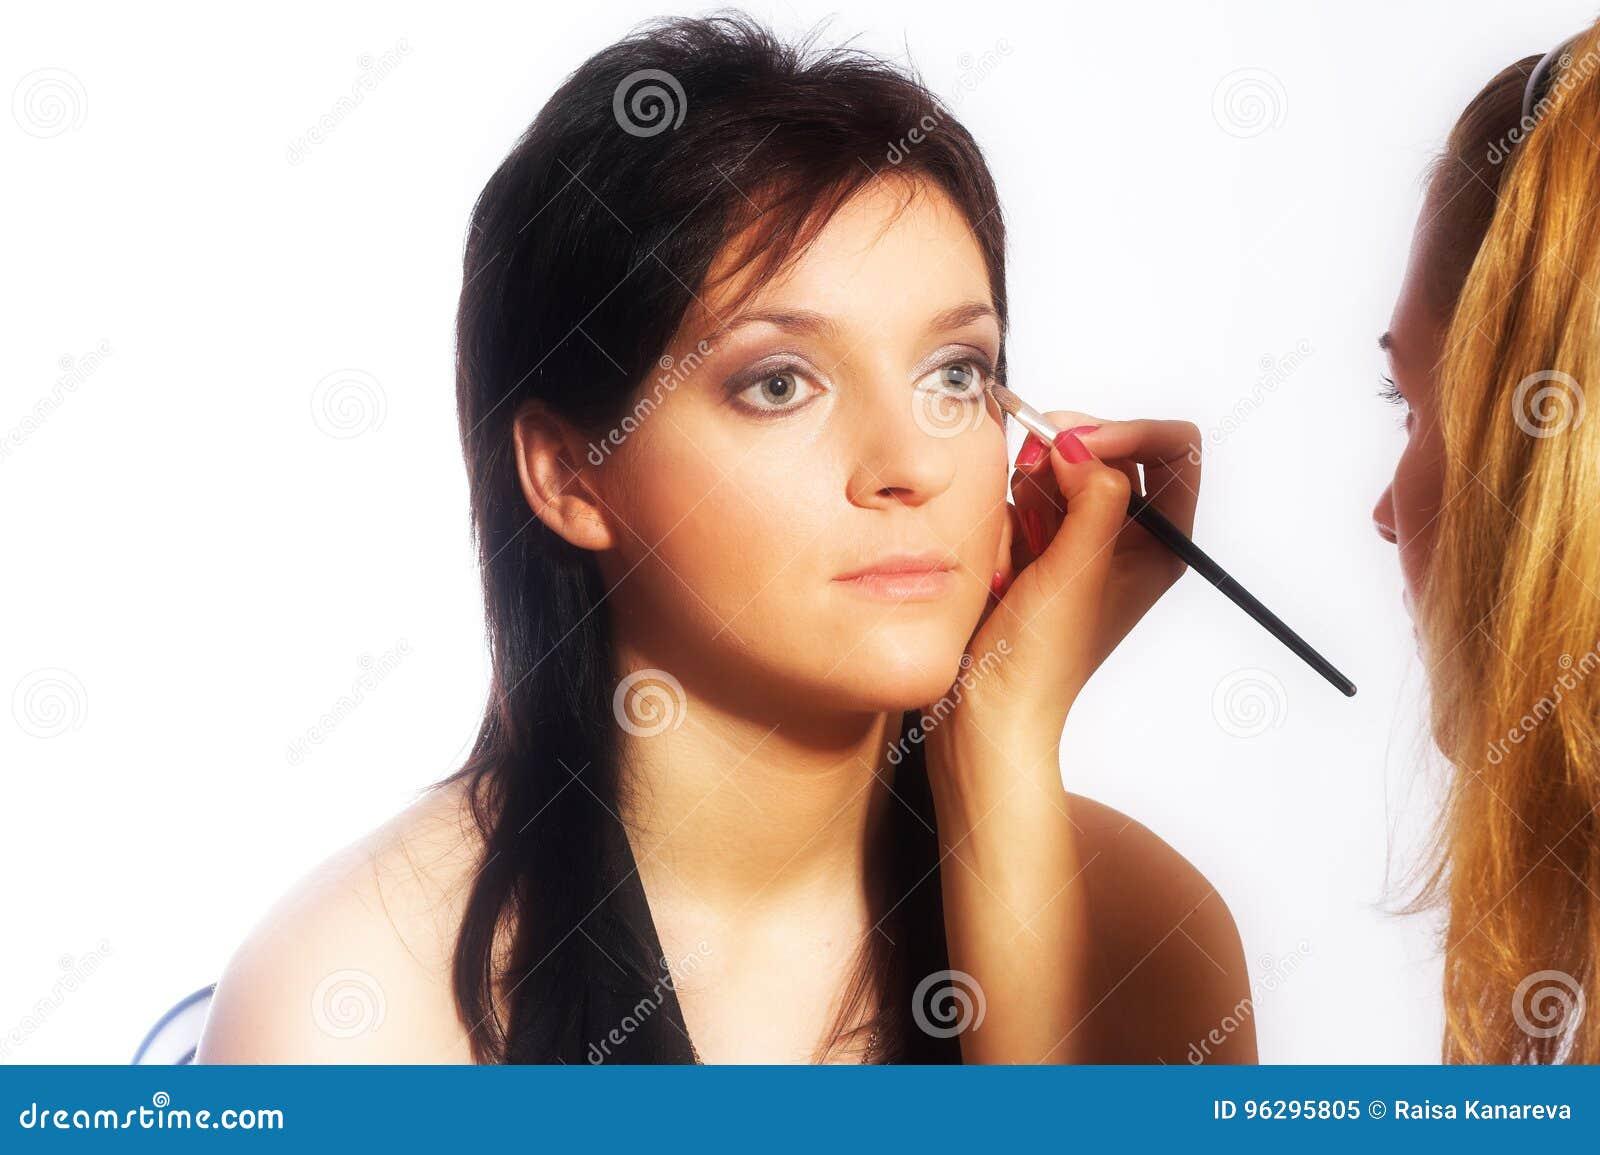 Makeup artist at work stock image  Image of make, human - 96295805